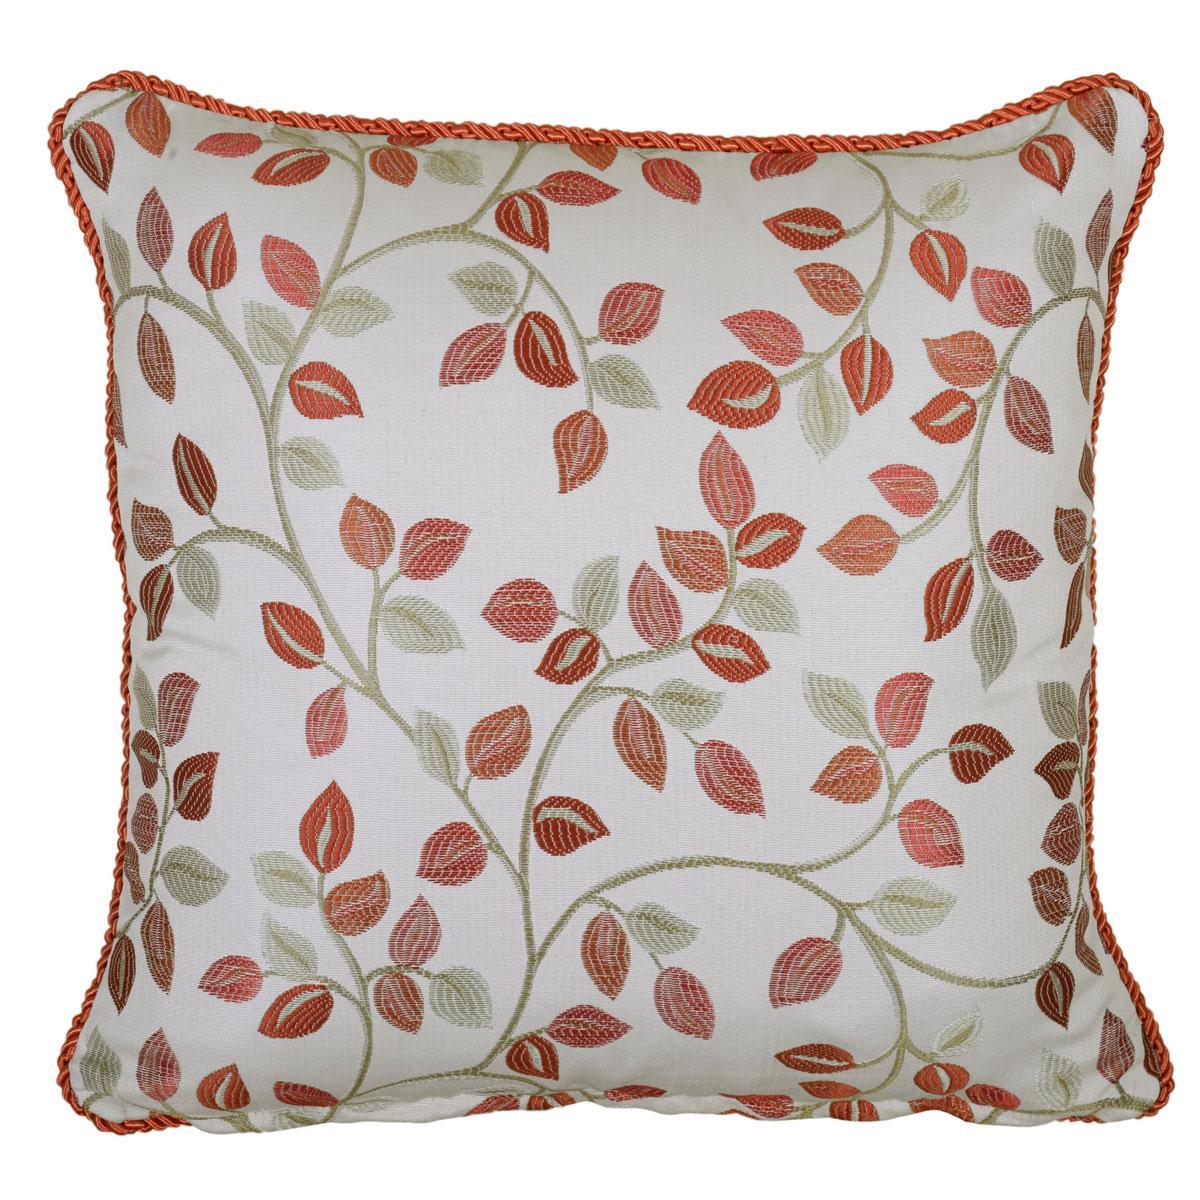 Terracotta Oakhurst Square Cushion Filled